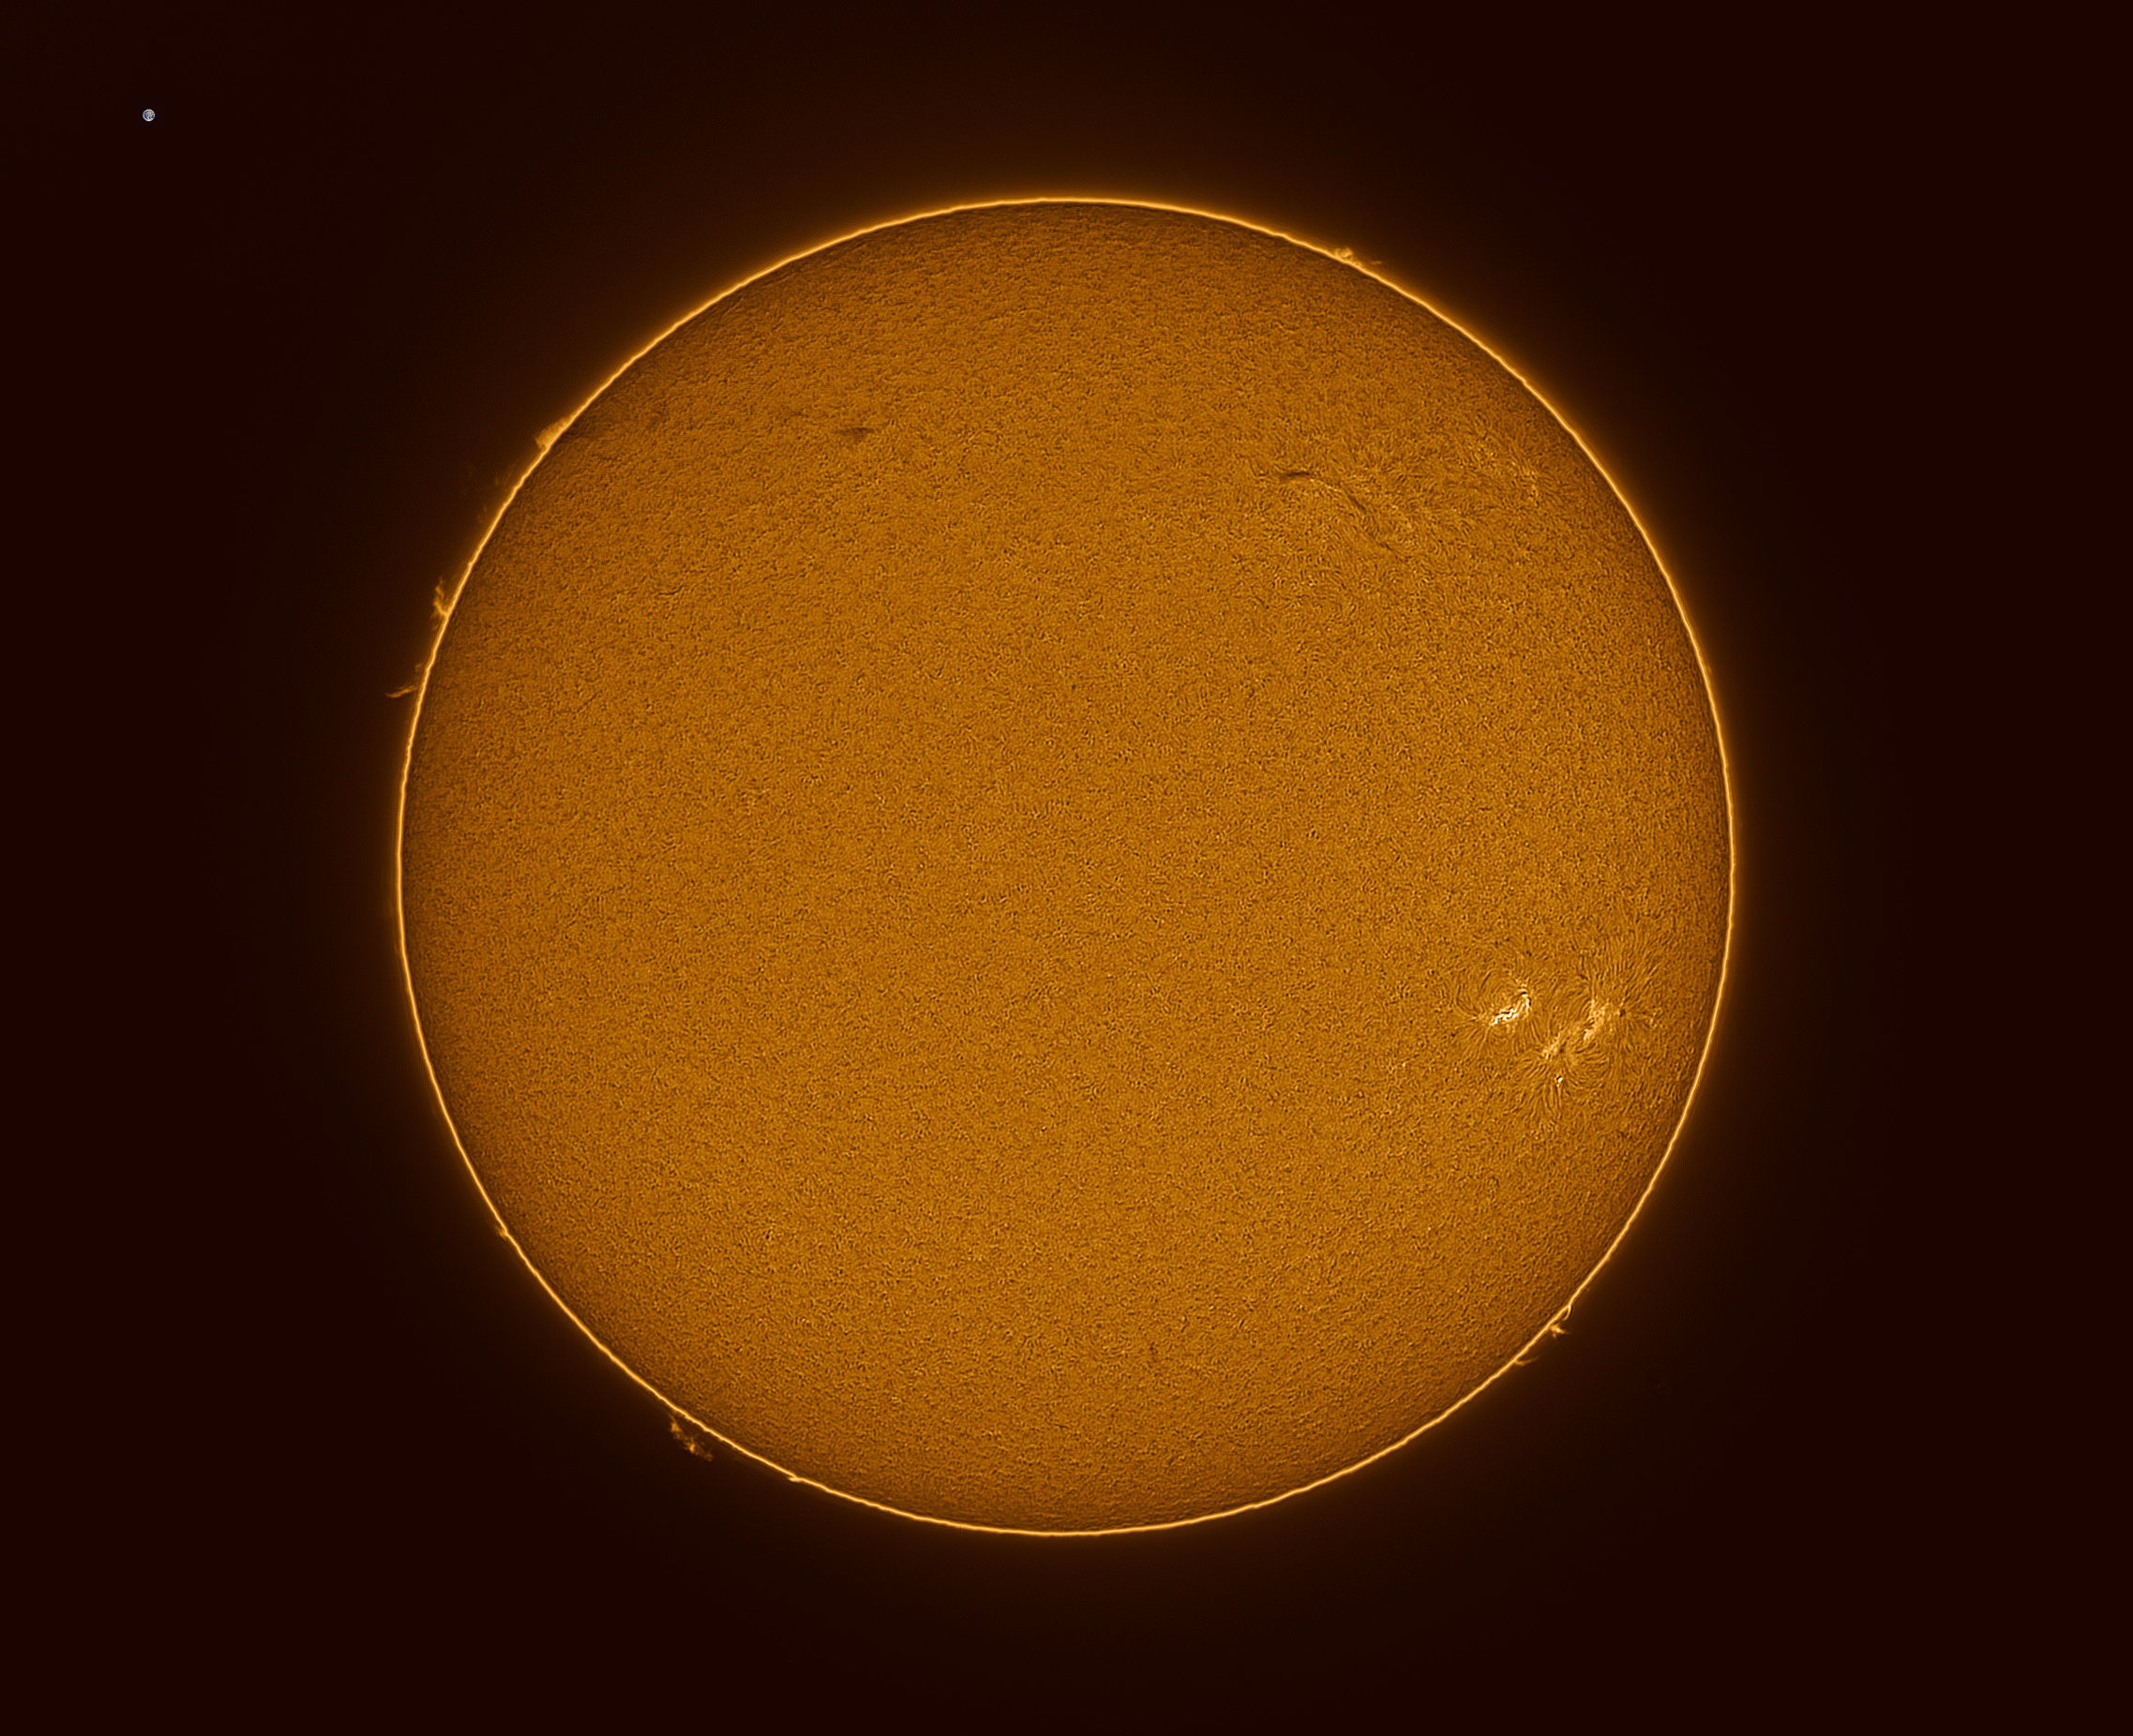 S20201029-13h52UT-sm40DS-fs60-bf10-gpx1.